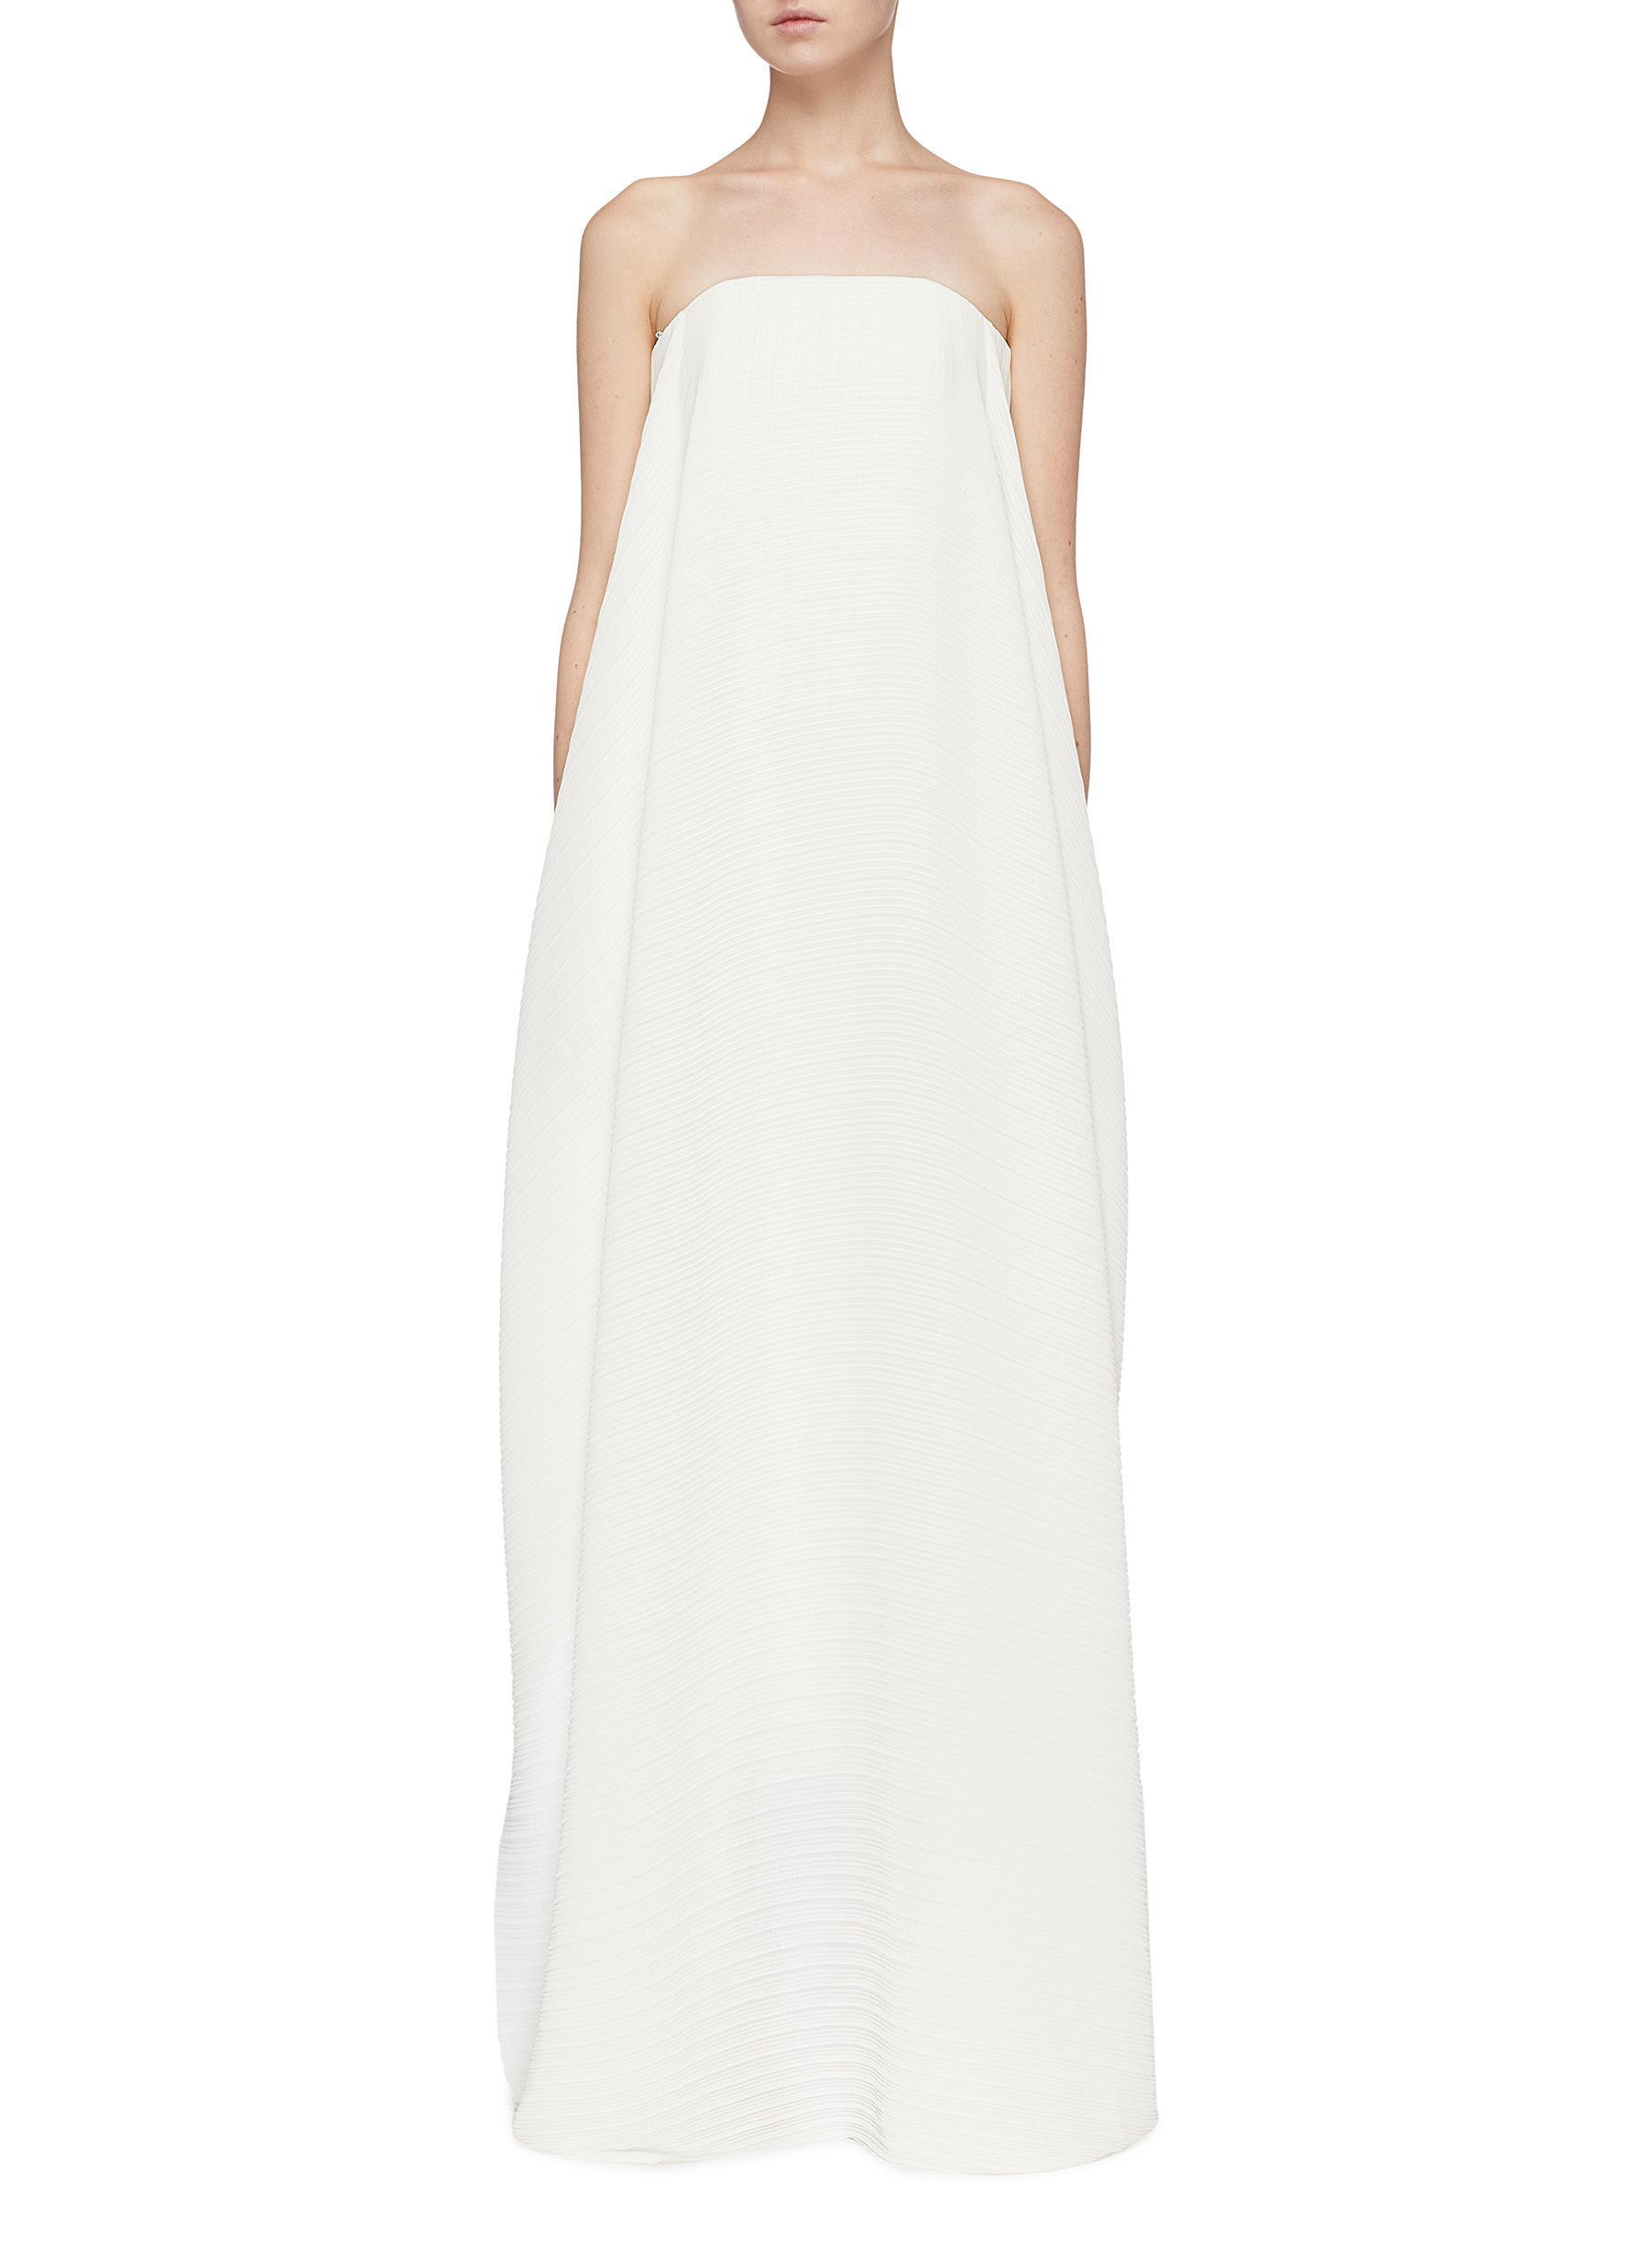 31ca1dd3e28 Solace London 'alette' Drape Front Pleated Strapless Maxi Dress in ...